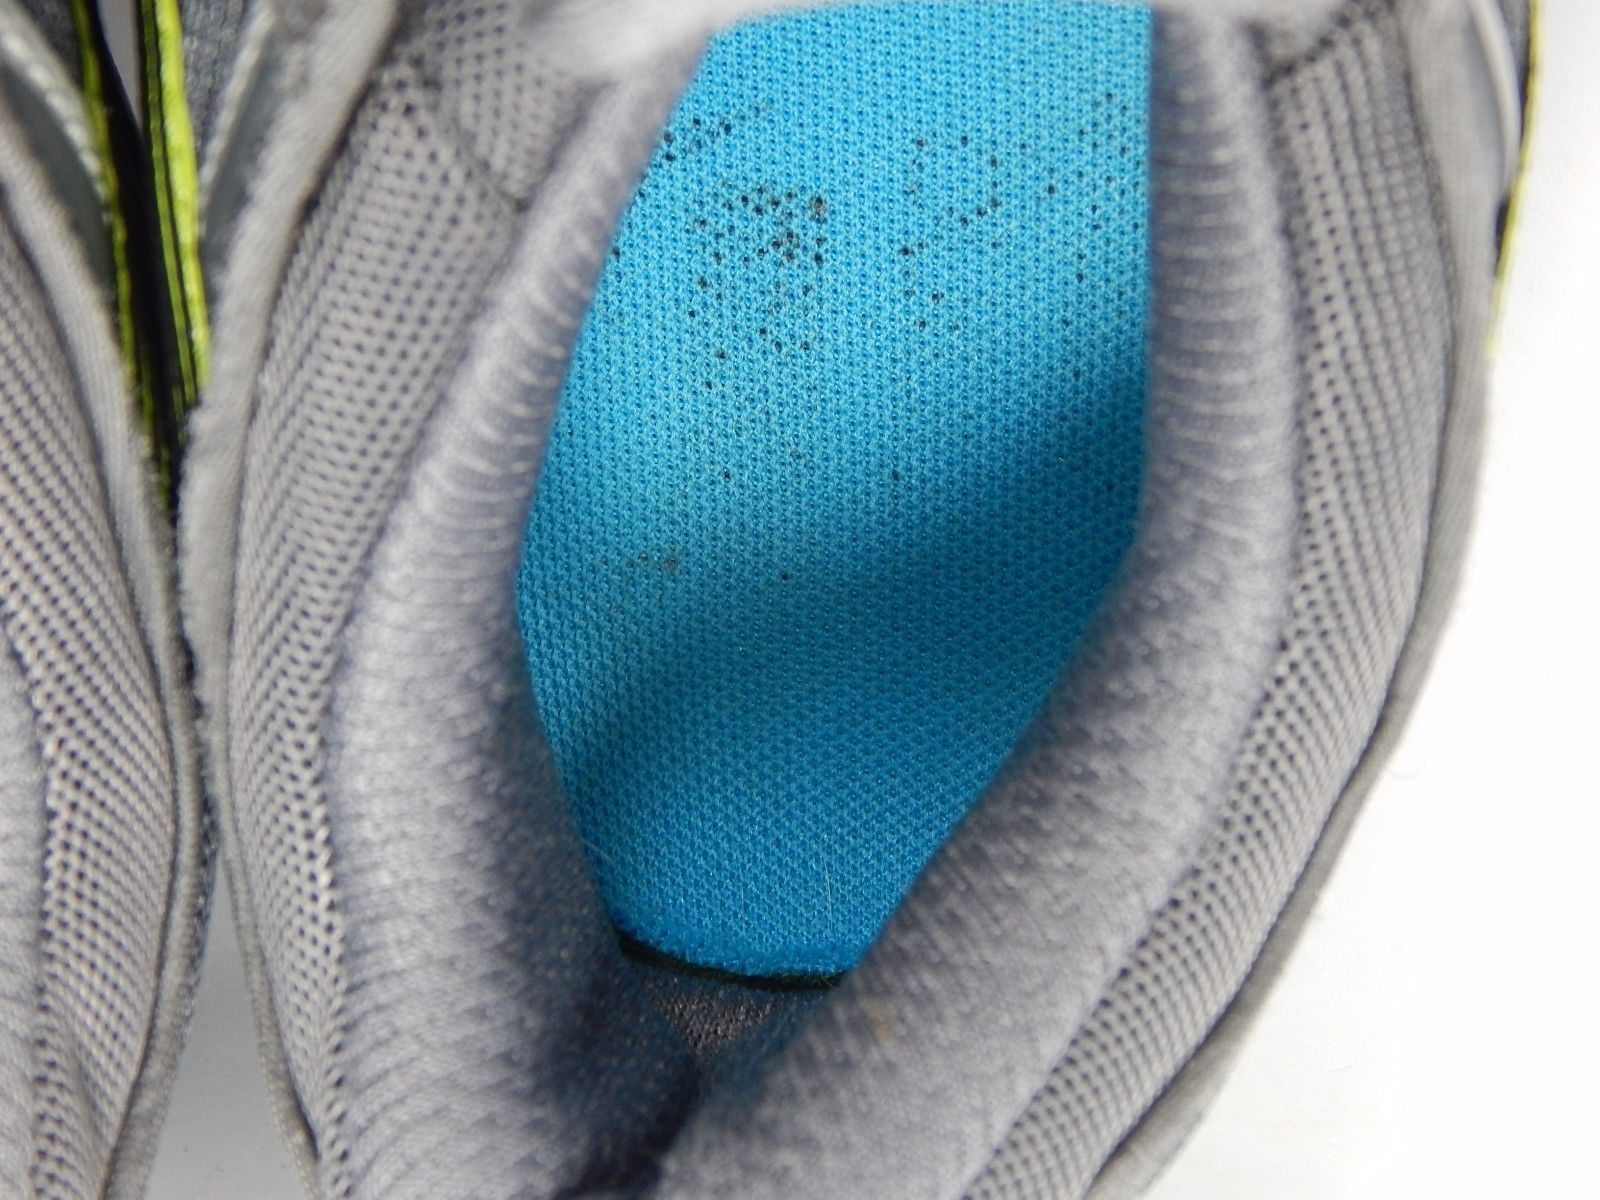 Puma Voltaic 3 Women's Running Shoes Size US 9 M (B) EU 40 Gray Green